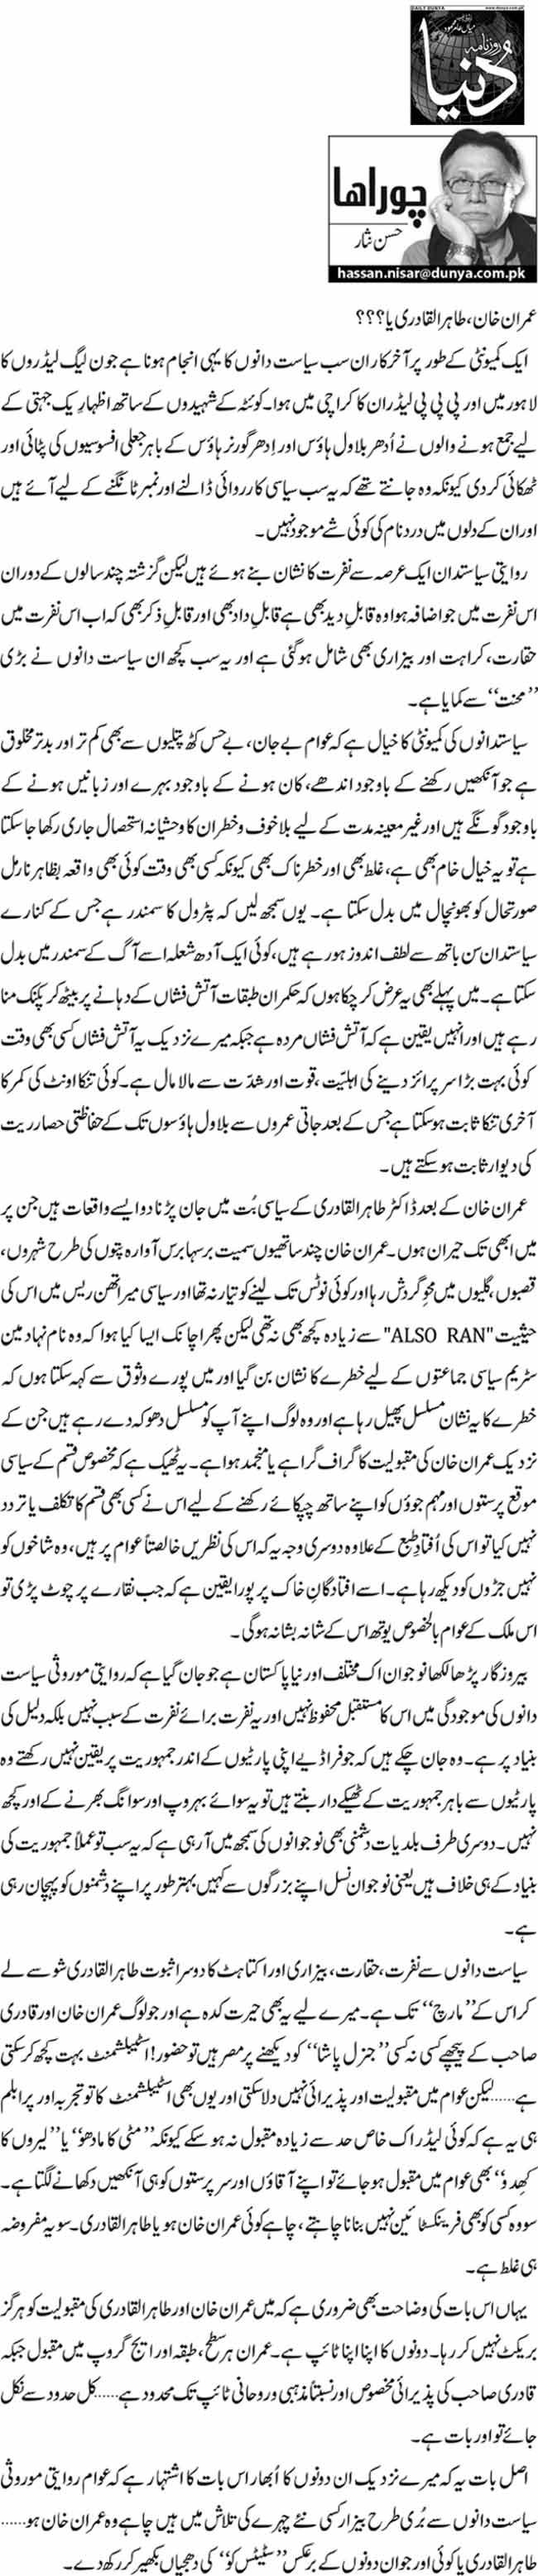 Imran Khan, Tahir ul Qadri ya??? - Hassan Nisar